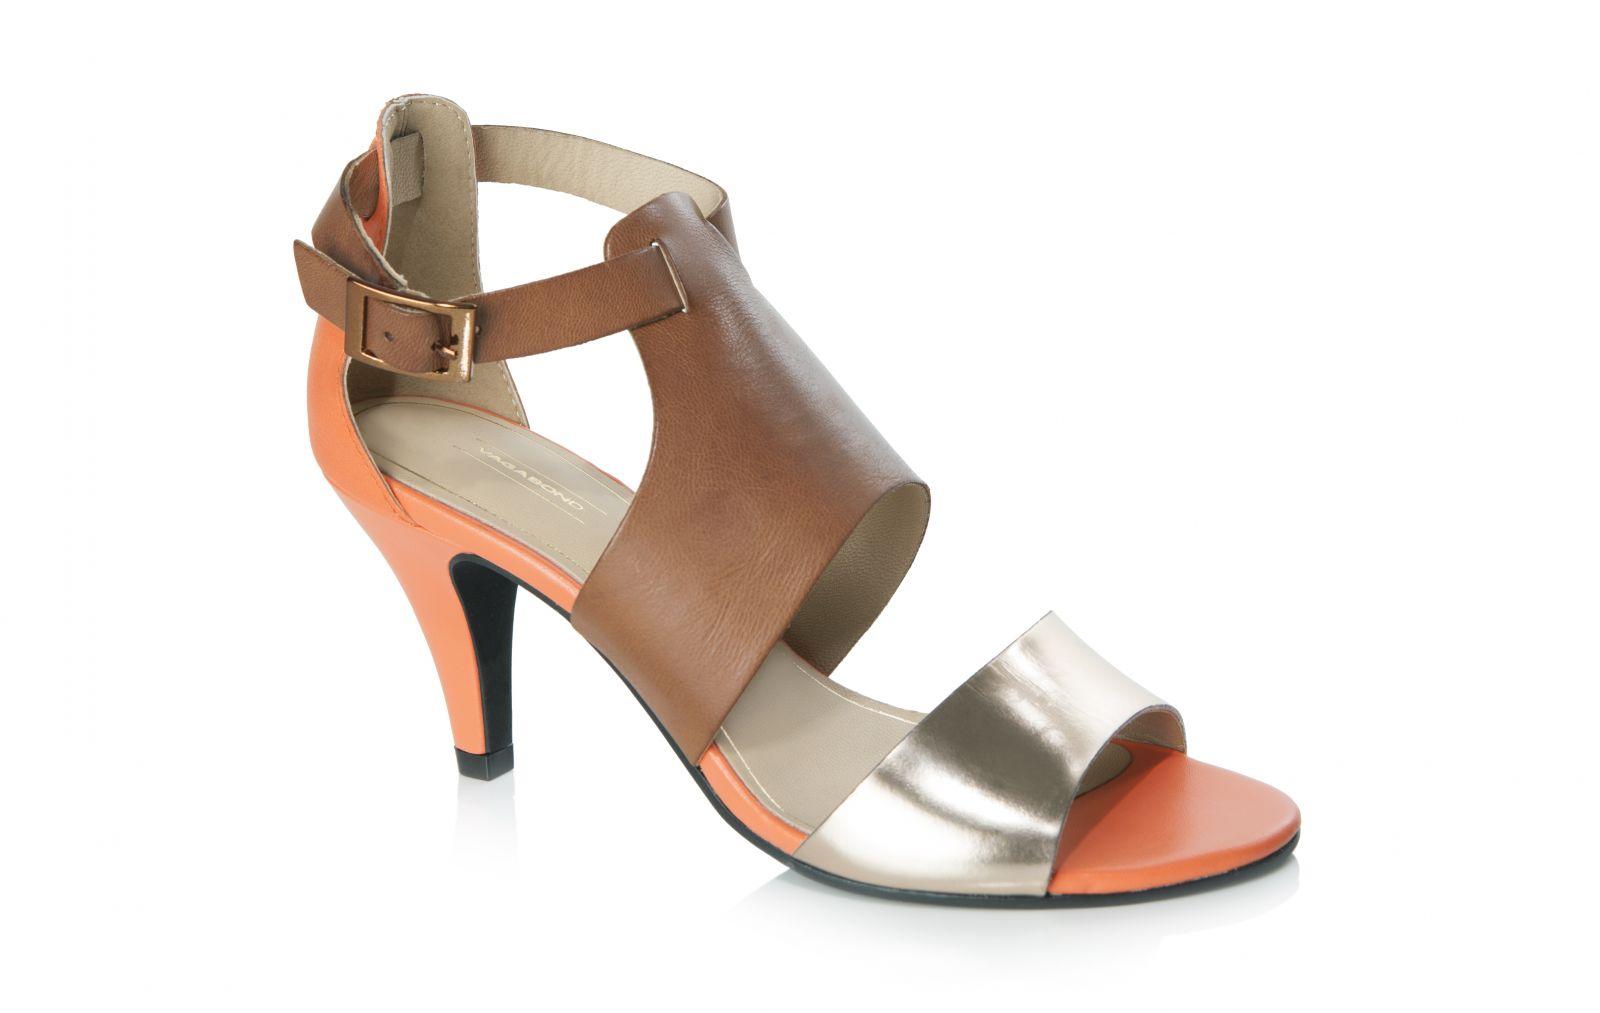 Коллекция обуви Intertop весна-лето 2014 - фото №2